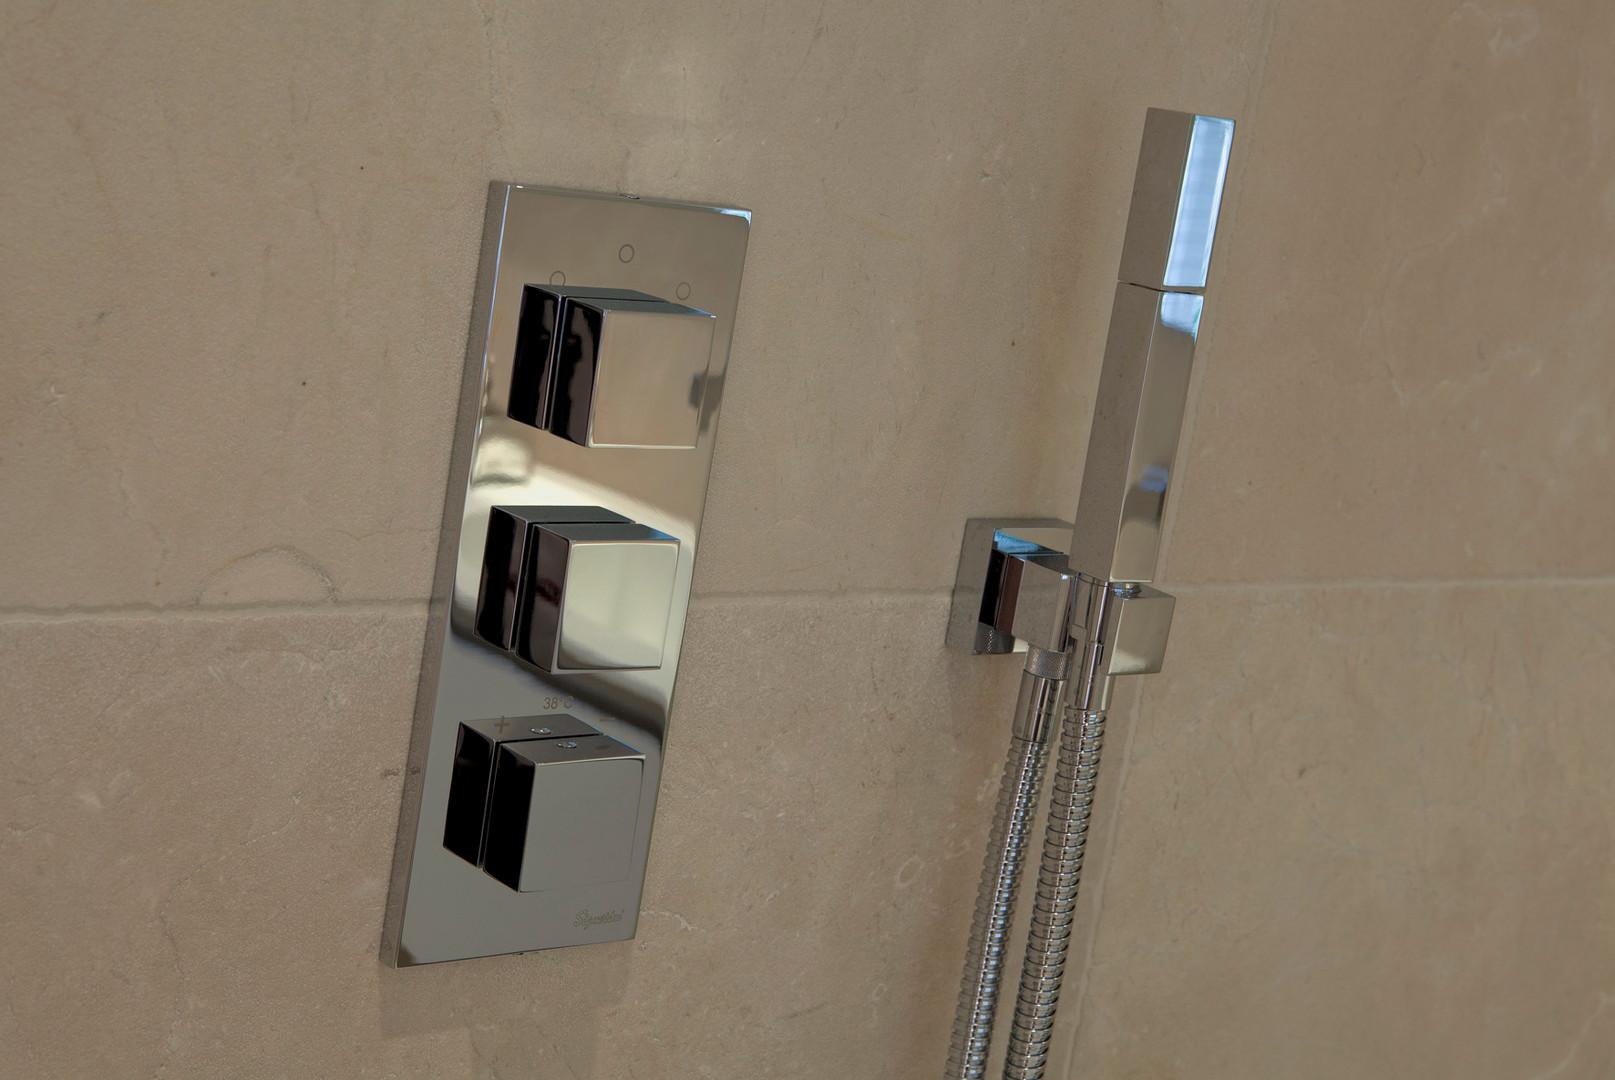 Shower_taps_2448_54.jpg